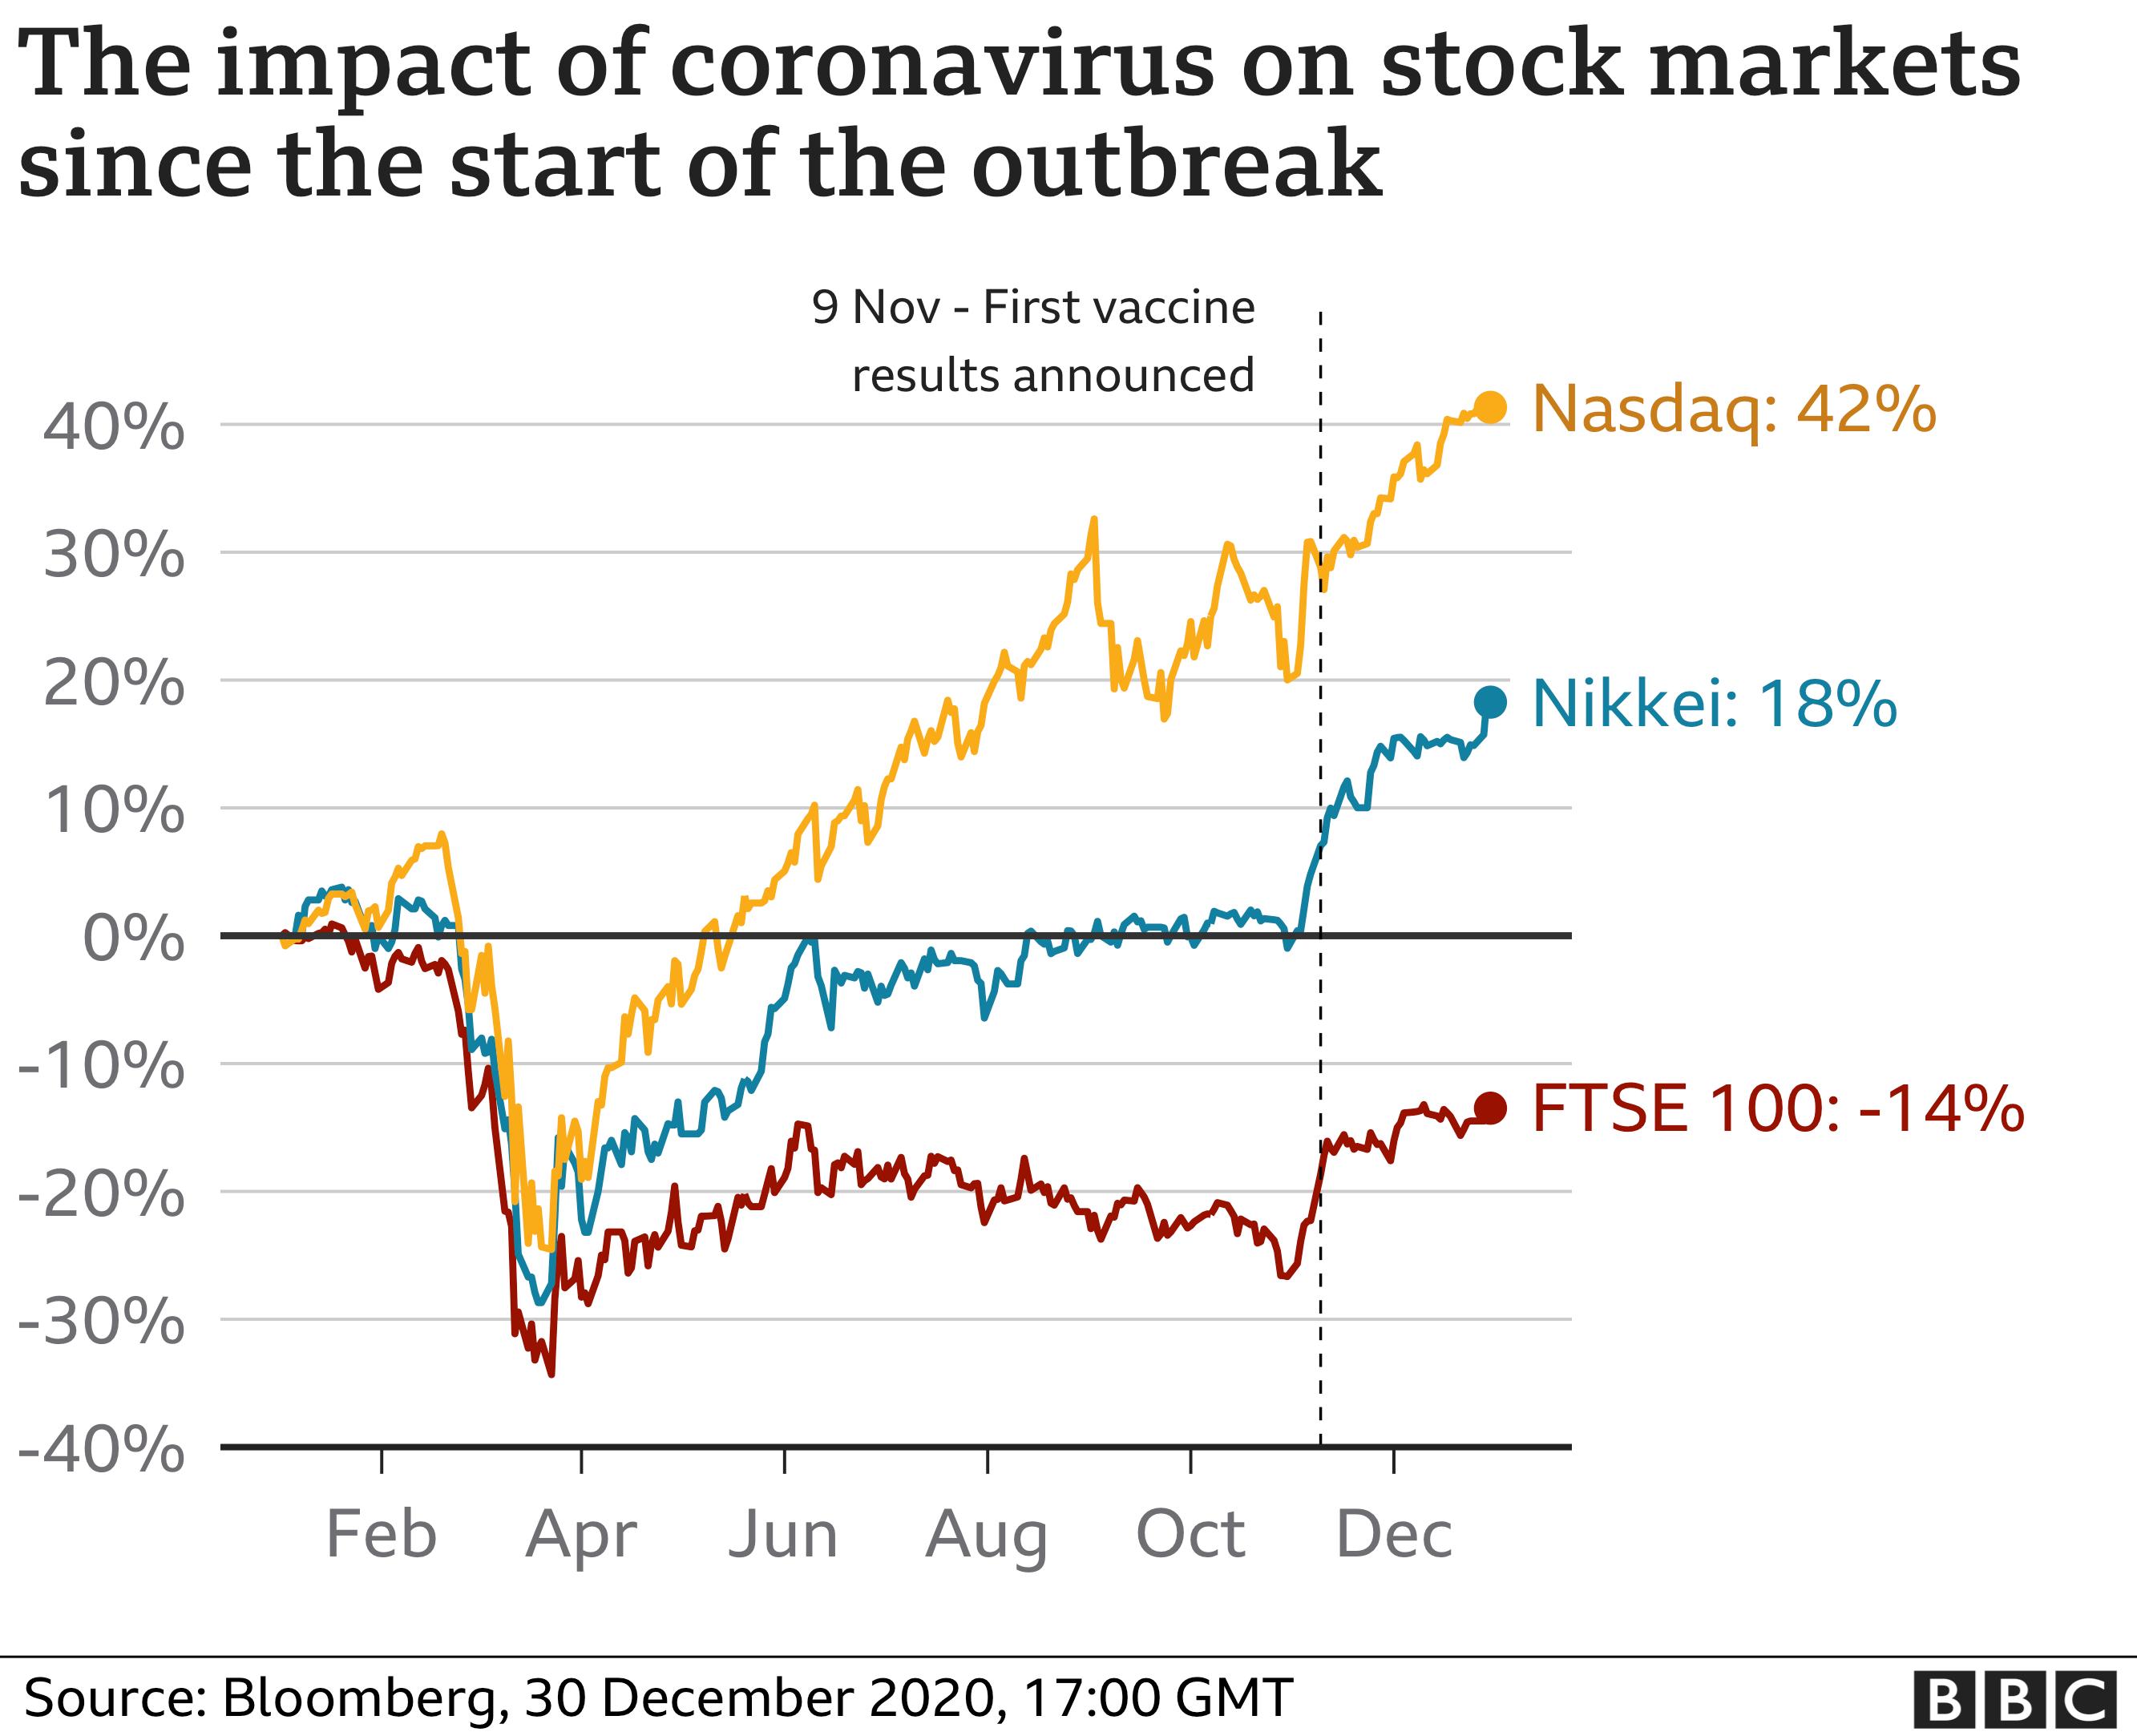 The impact of coronavirus on stock markets since the start of outbreaks